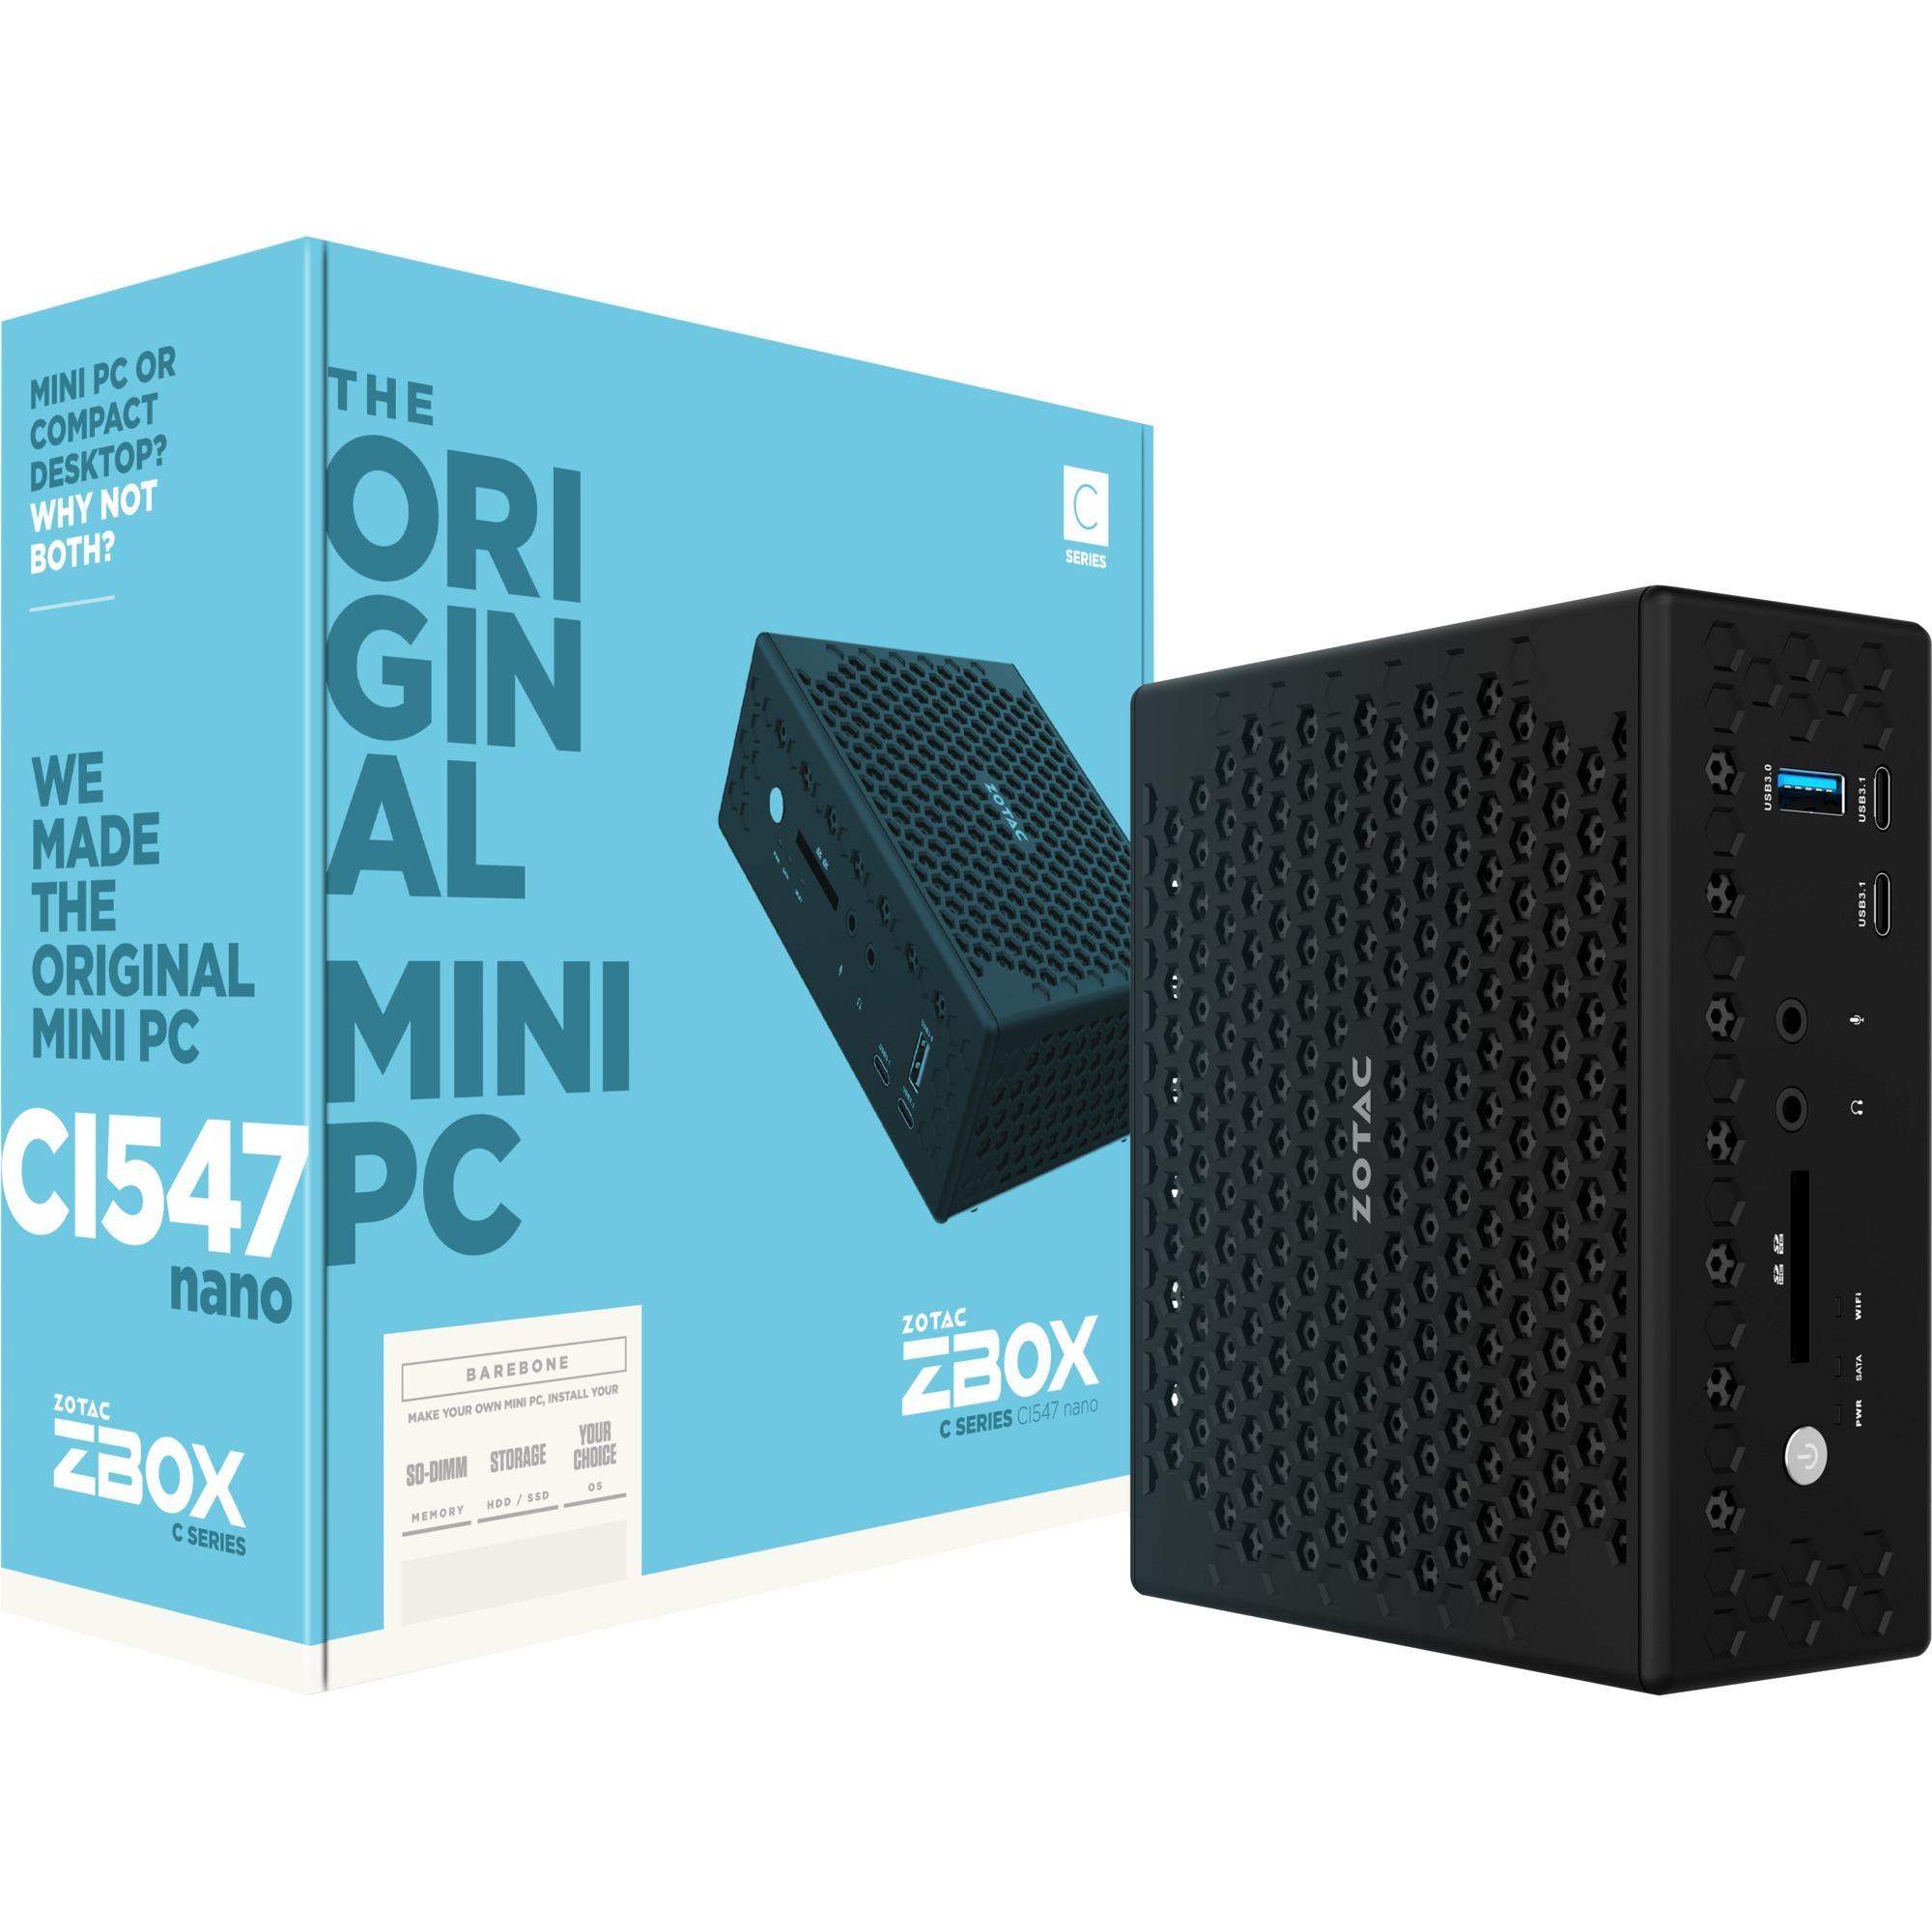 CI547 Nano Intel SoC BGA 1356 2.50GHz i5-7200U PC de dimension 1L Noir, Barebone